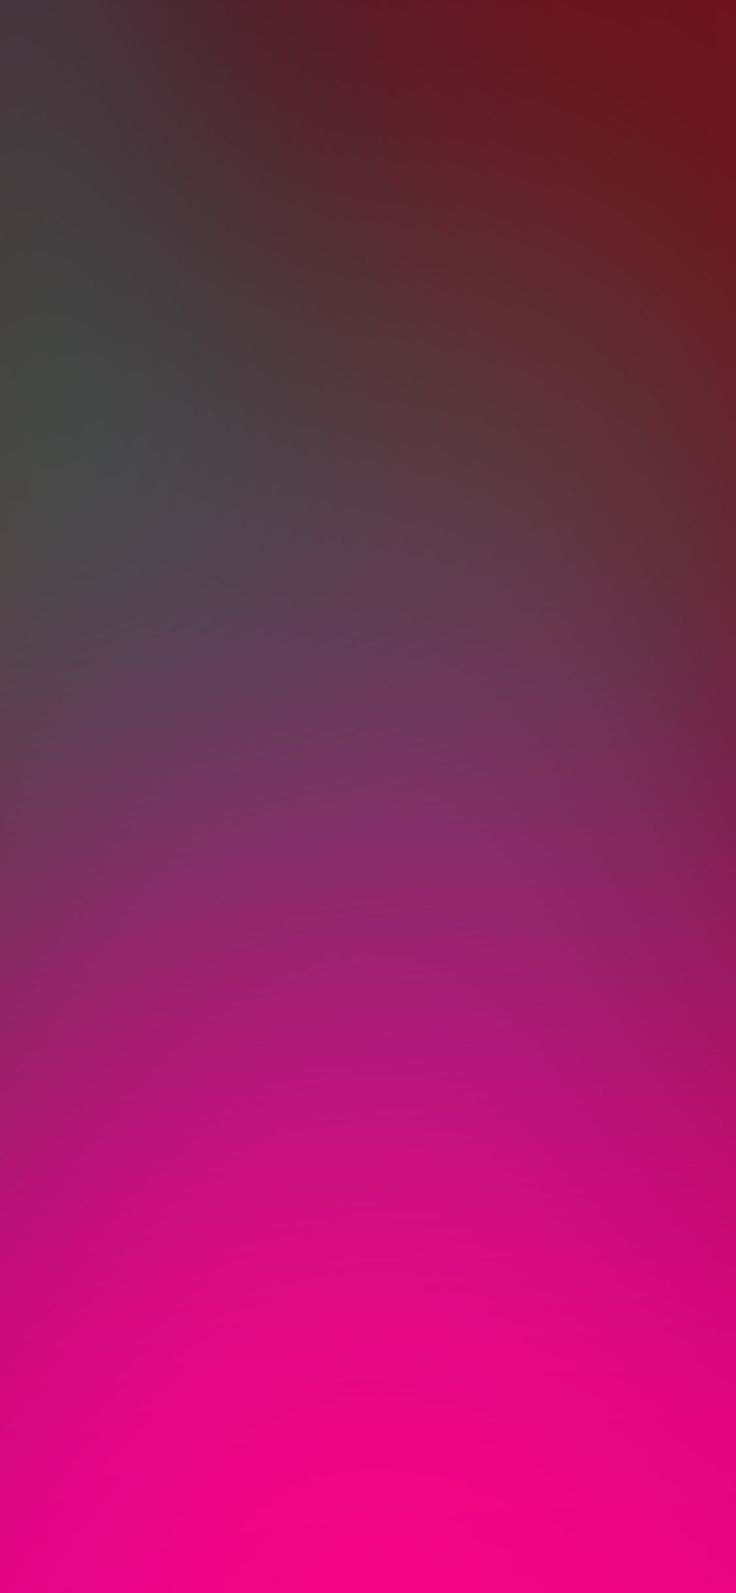 Iphone X Wallpaper Sm65 Red Pink Blur Gradation Via Iphonexpapers